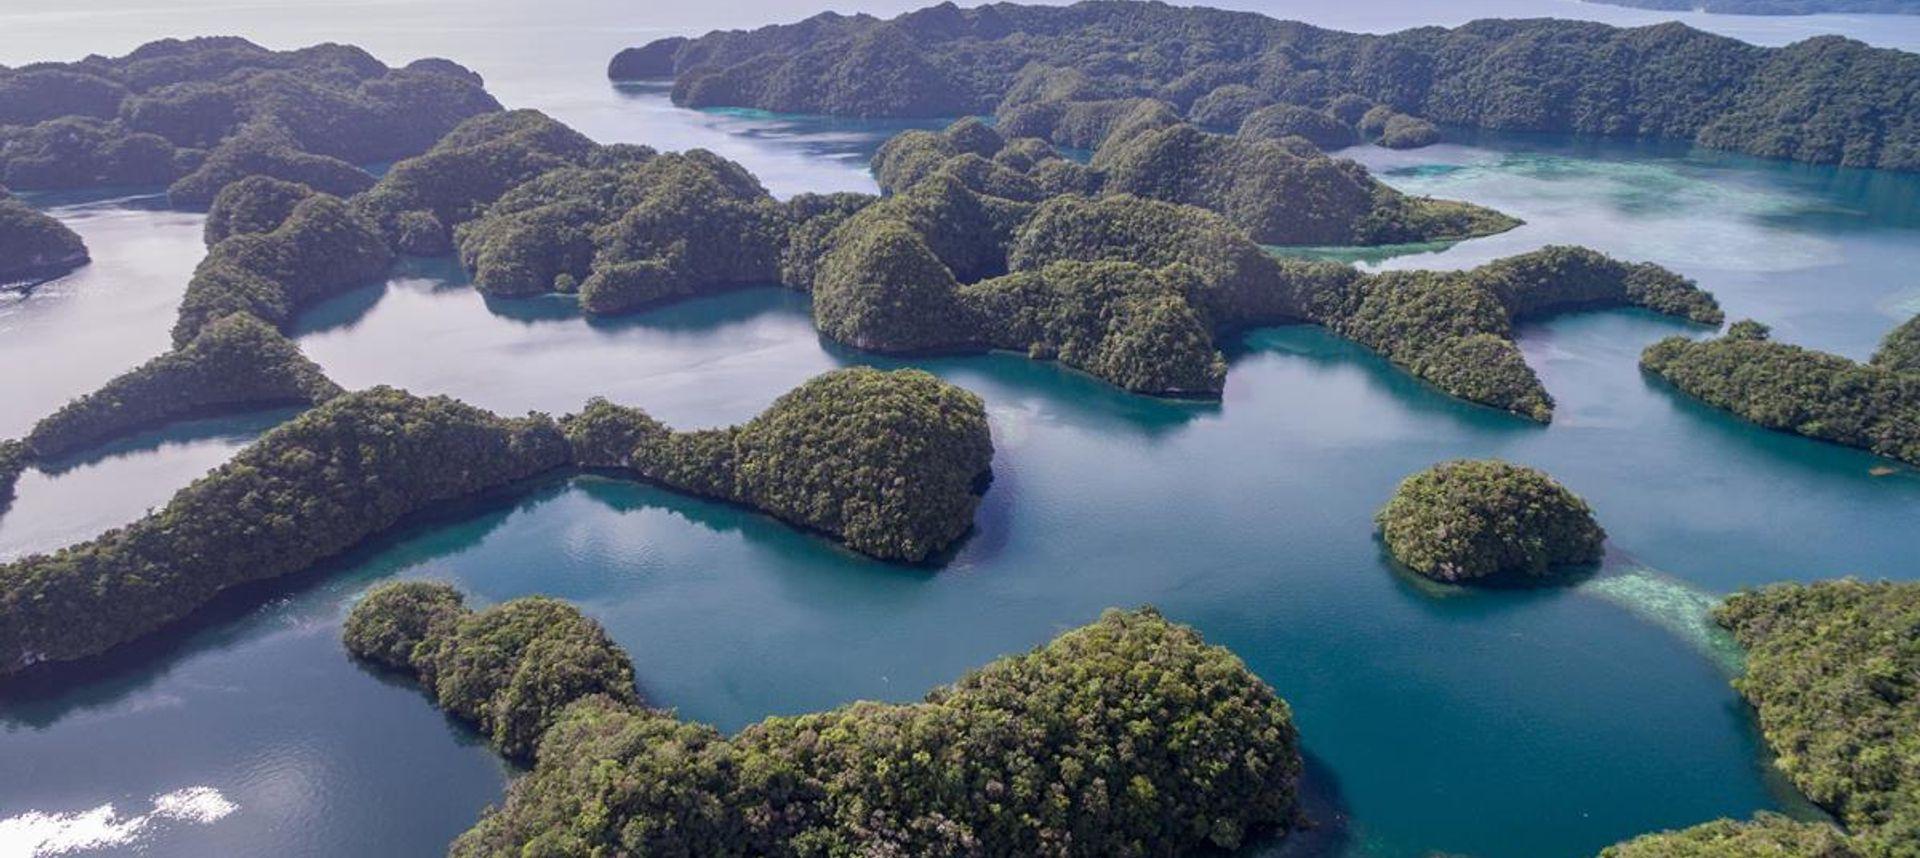 Aerial shot of Palau's famous Seventy Islands, Micronesia(dreamstime.com)